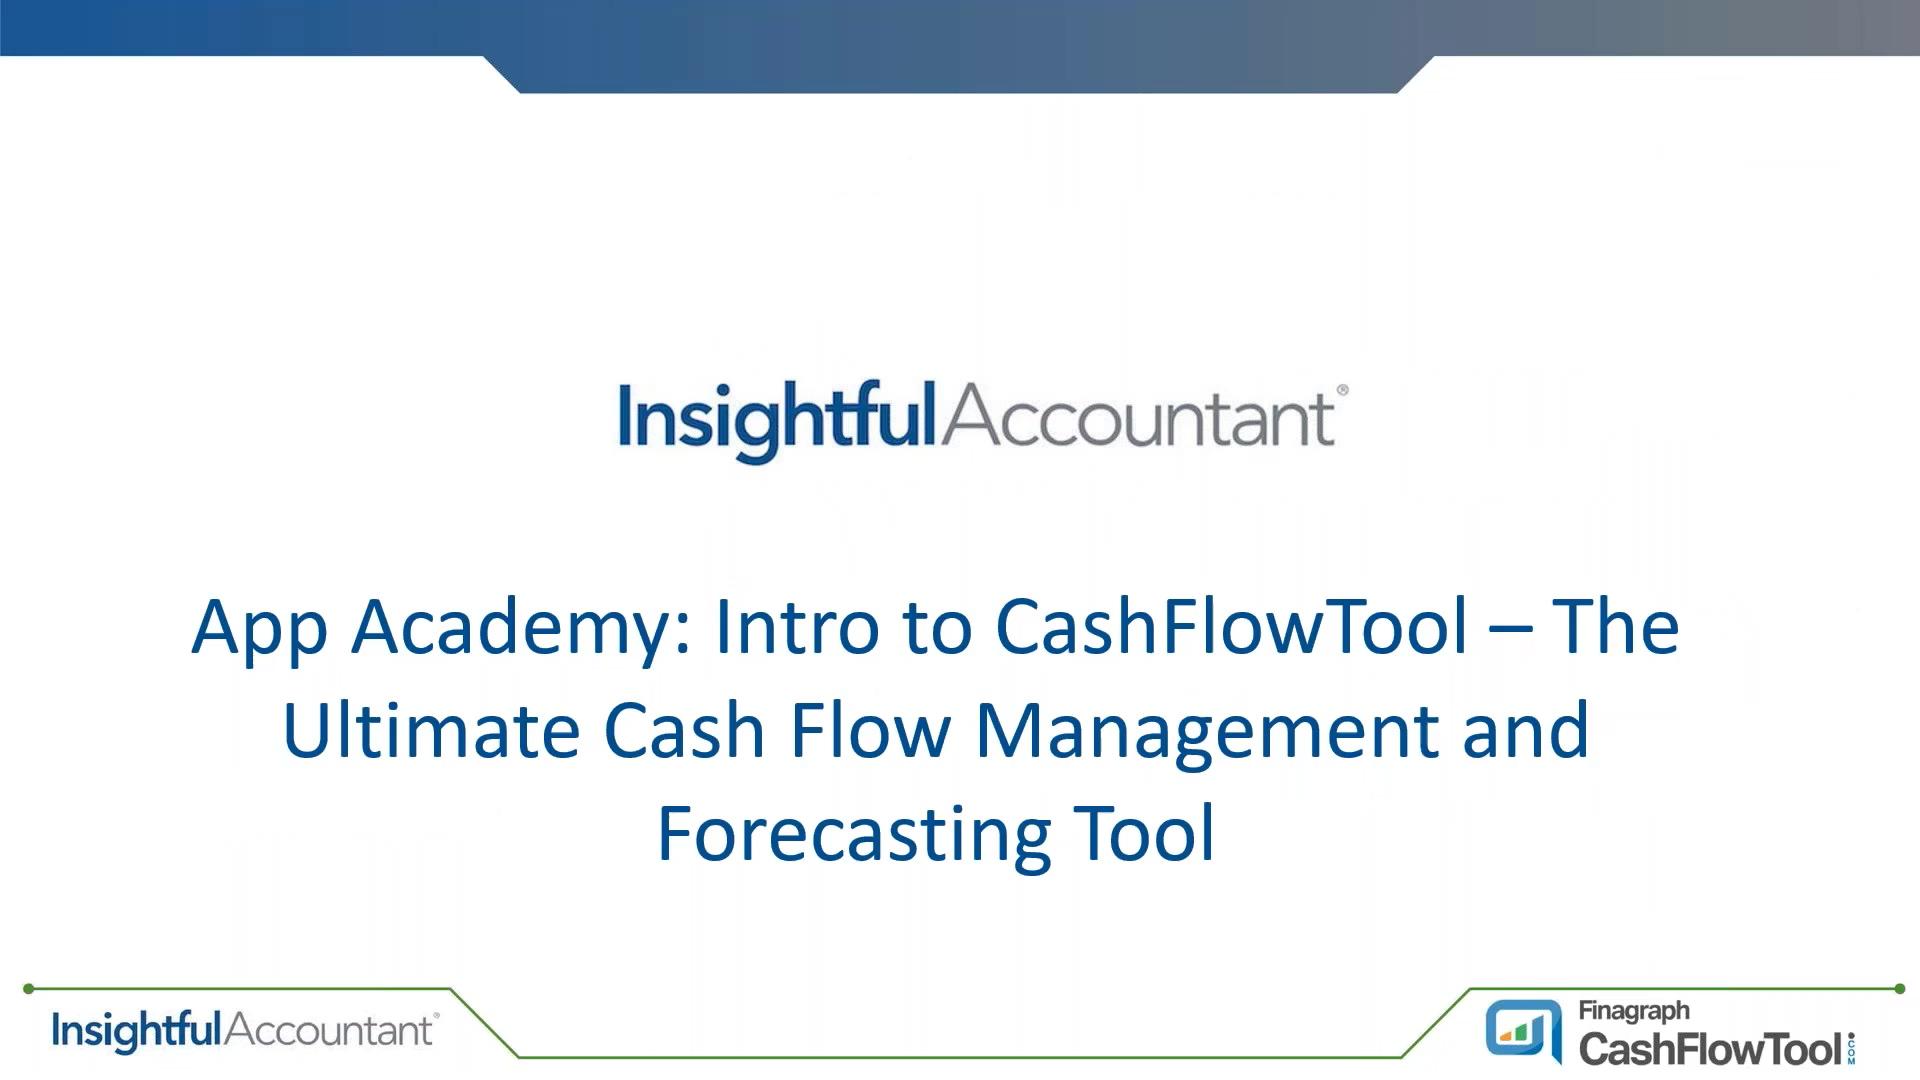 20190813 App Academy Intro to CashFlowTool The Ultimate Cash Flow Management and Forecasting Tool (u